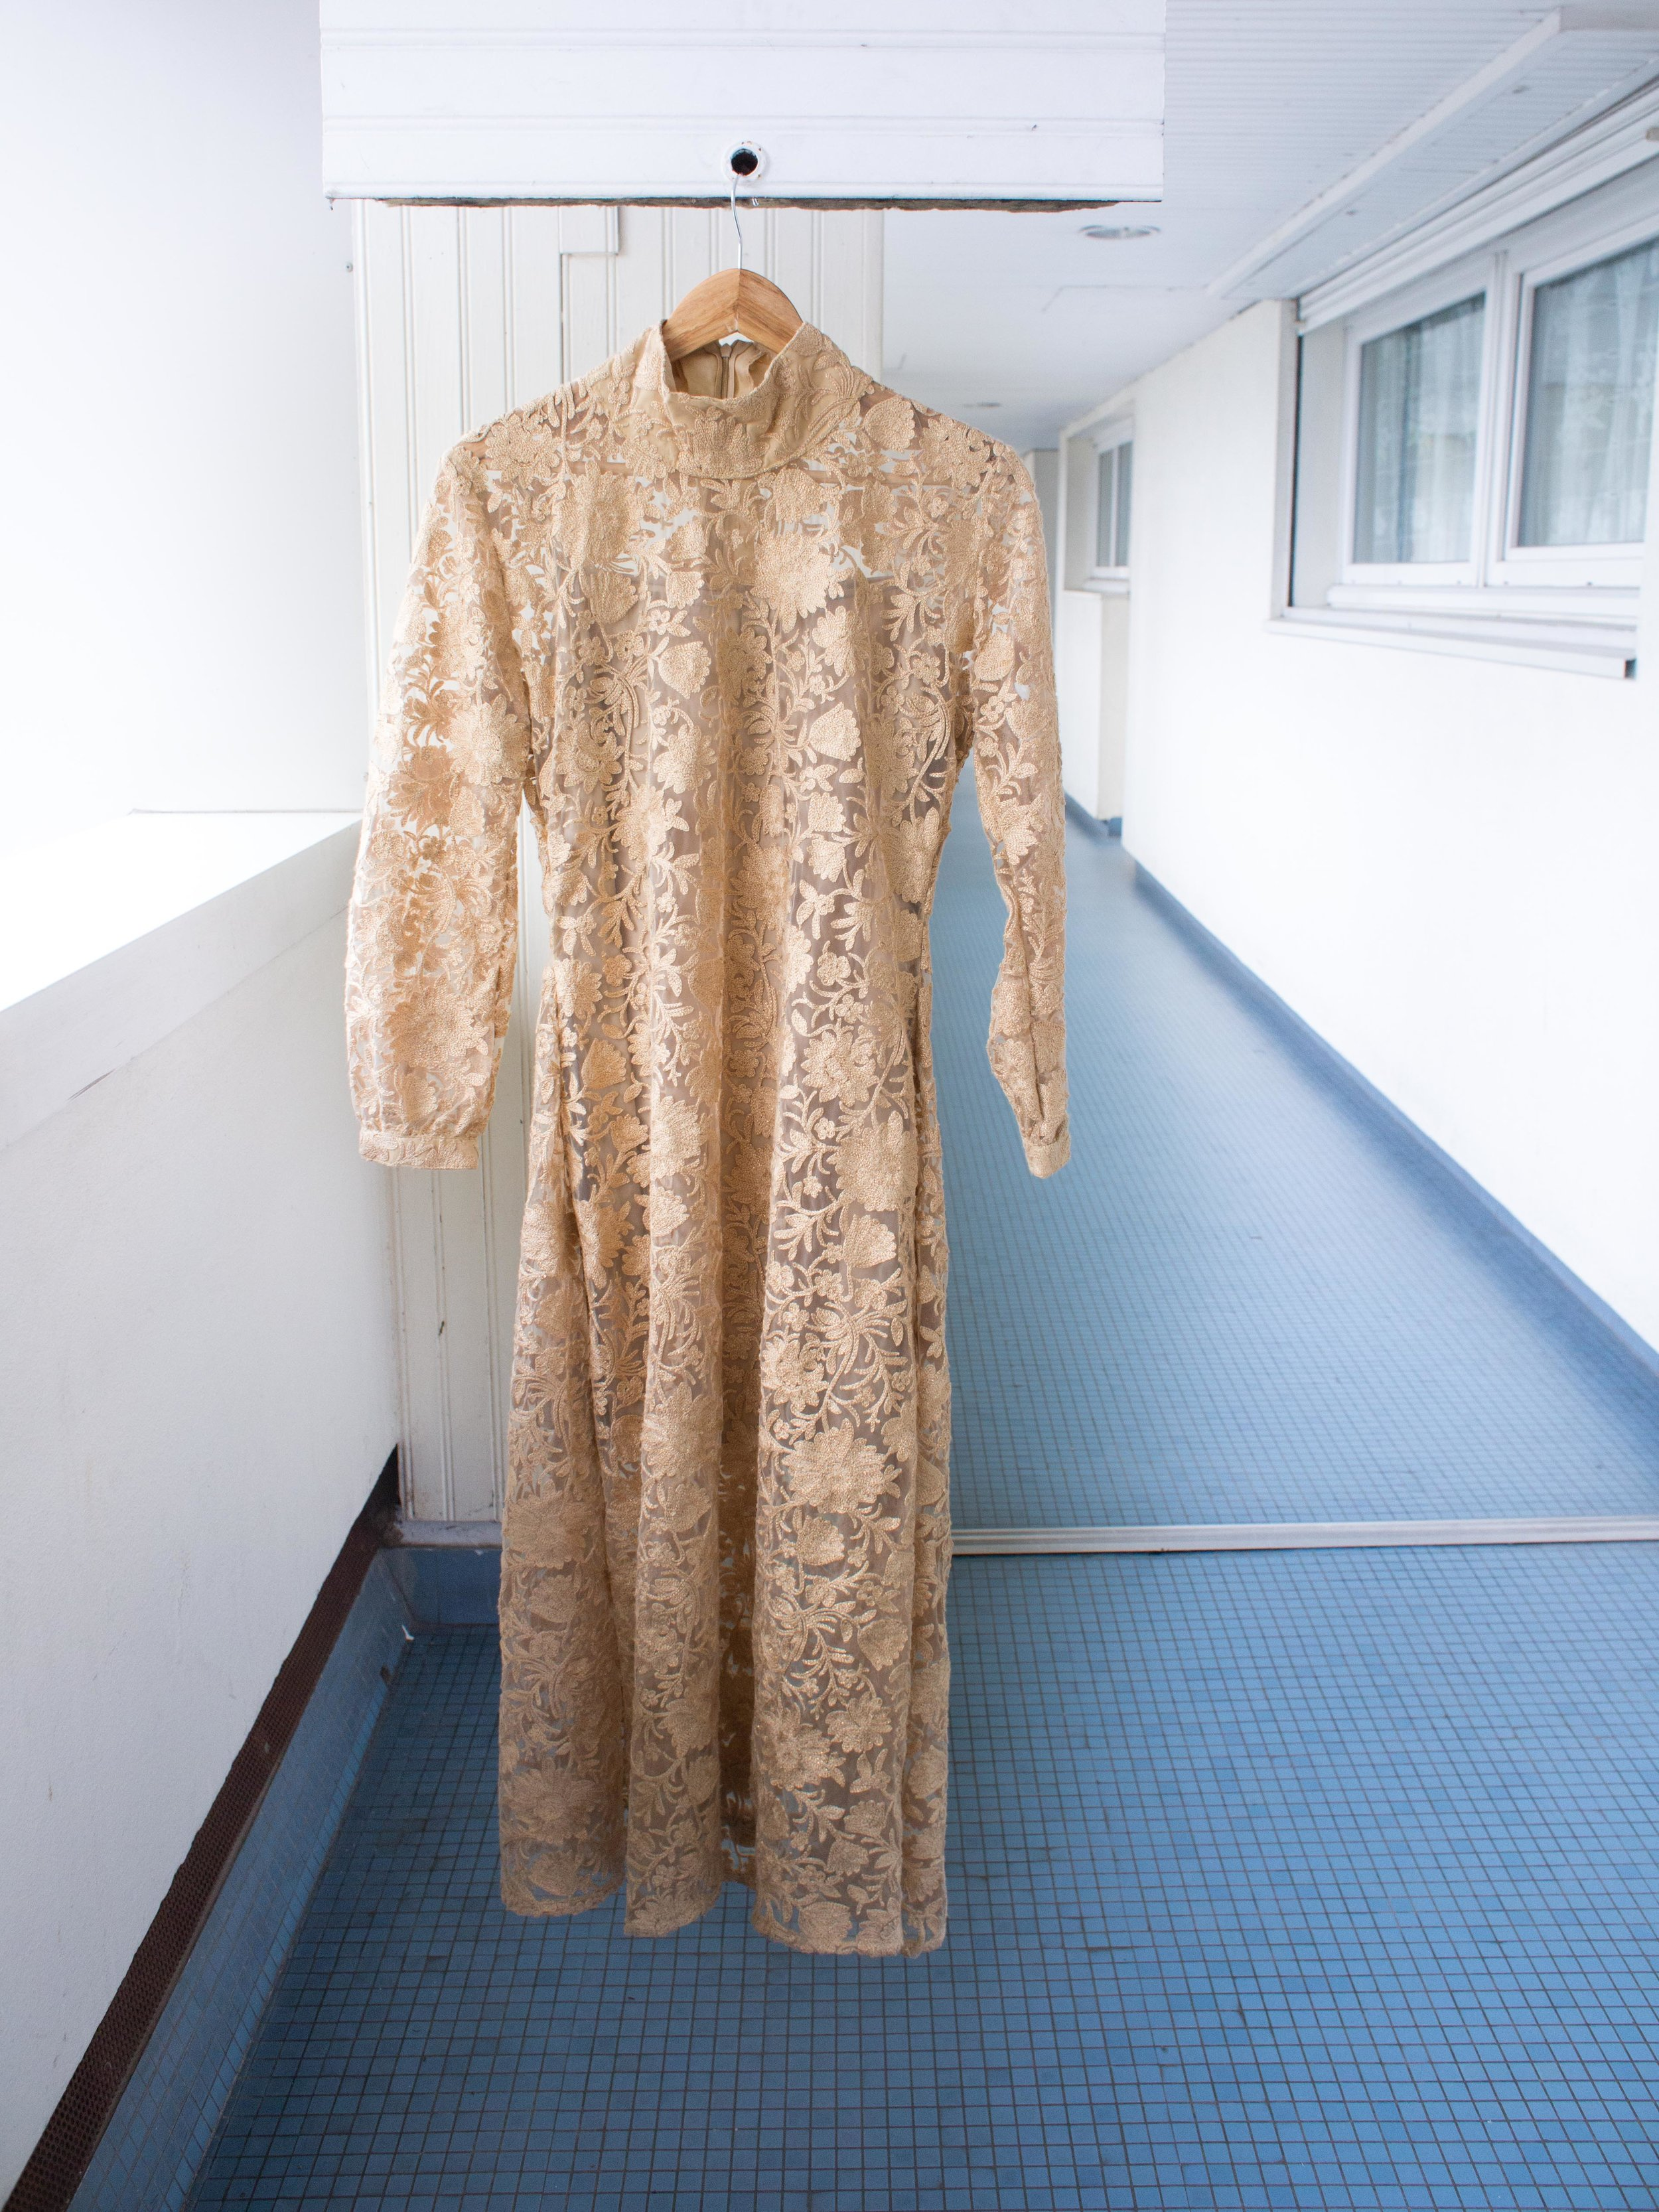 NIKA EVENING DRESS             100% TISSUE LACE -